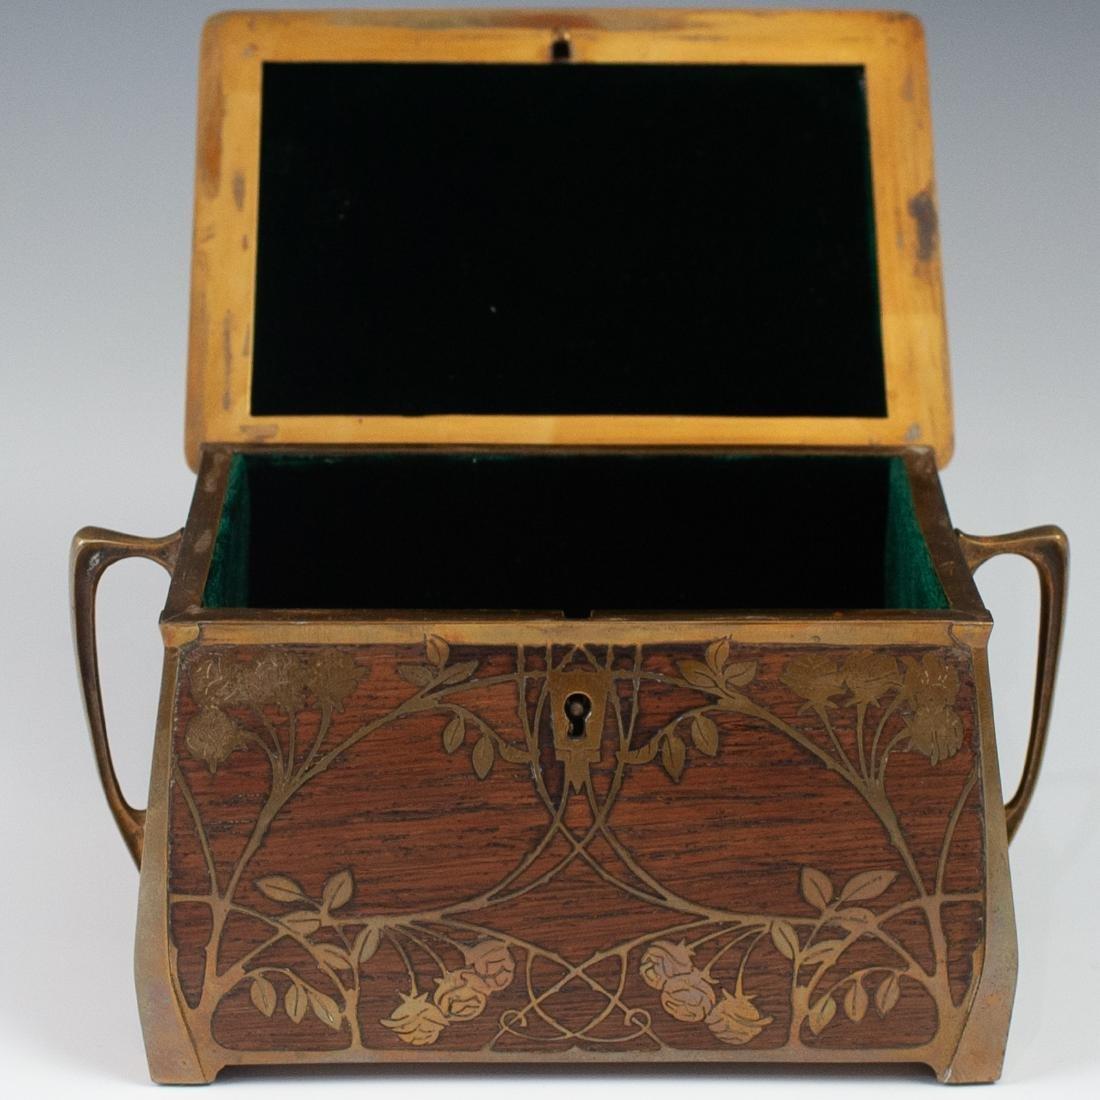 Art Nouveau Erhard Sohne Wood Box - 2